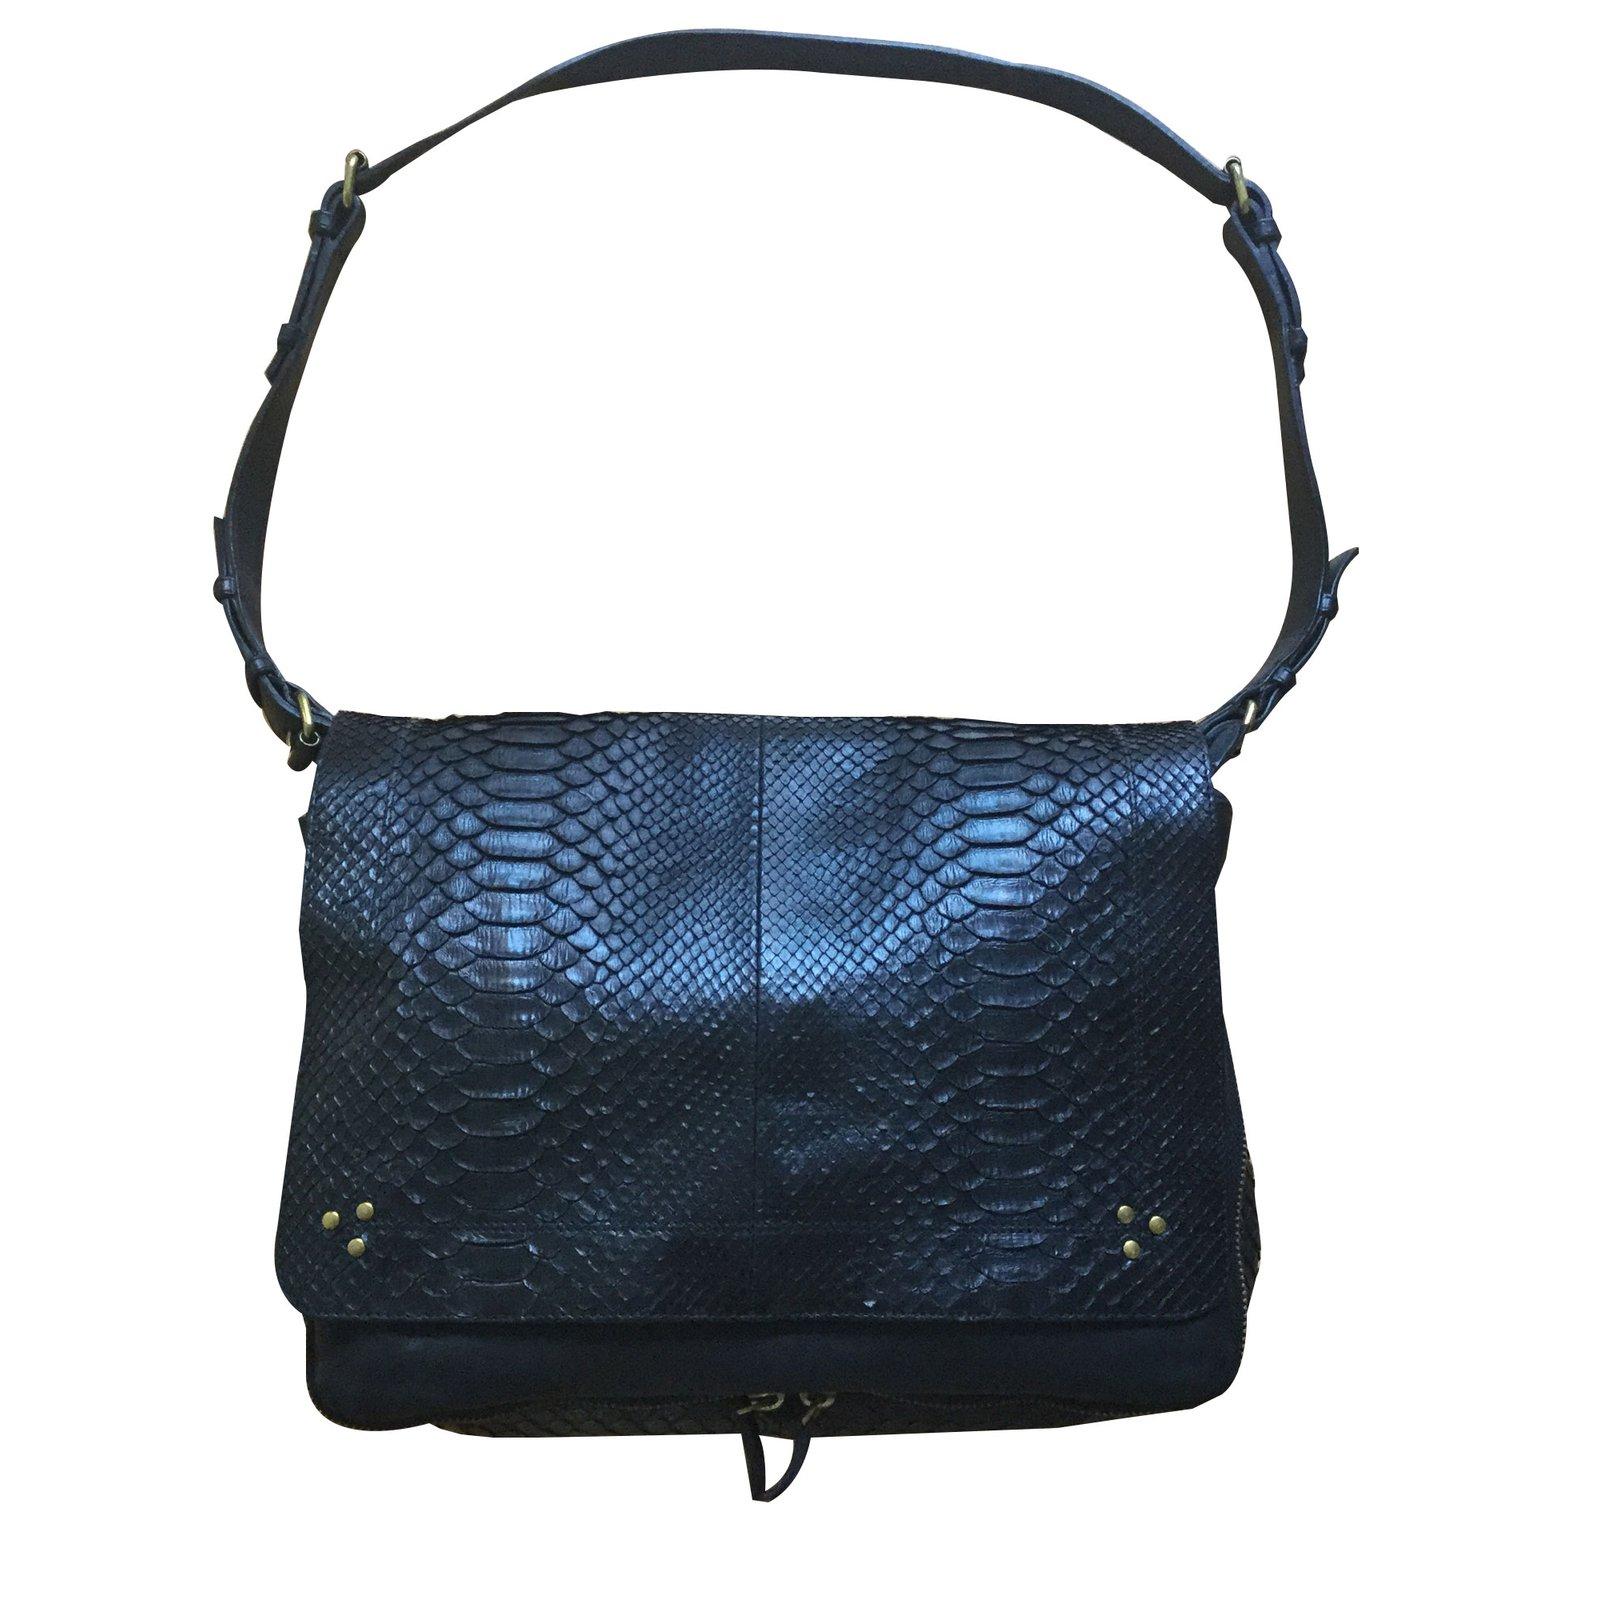 b56620741ad78 Jerome Dreyfuss albert Handbags Python Black ref.85065 - Joli Closet